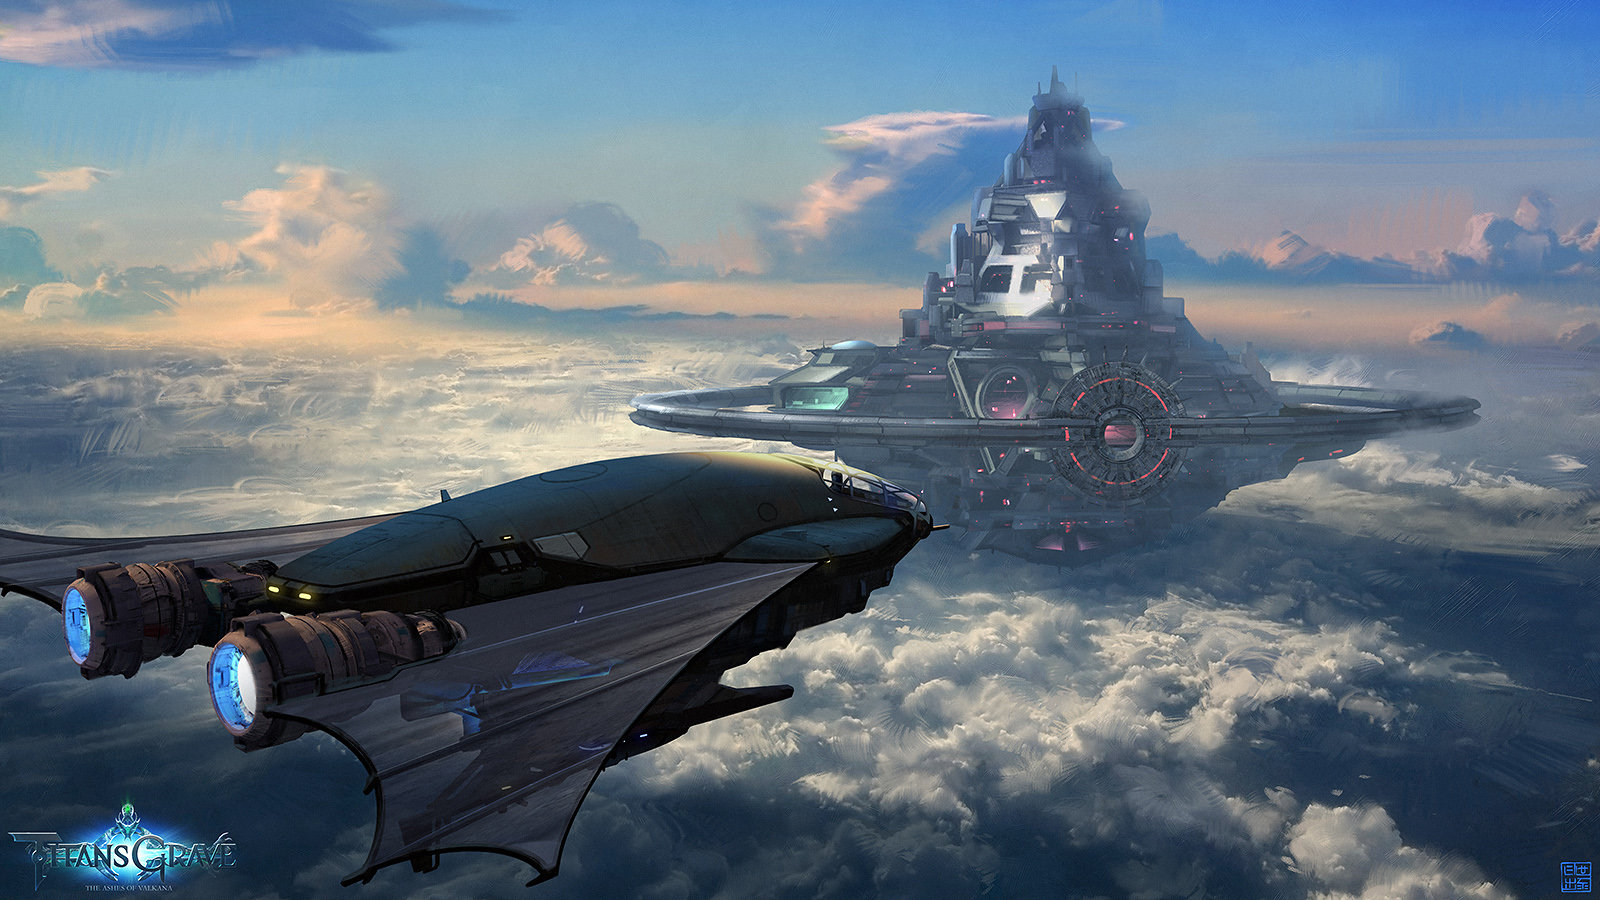 Lorenz hideyoshi ruwwe sky castle revised s